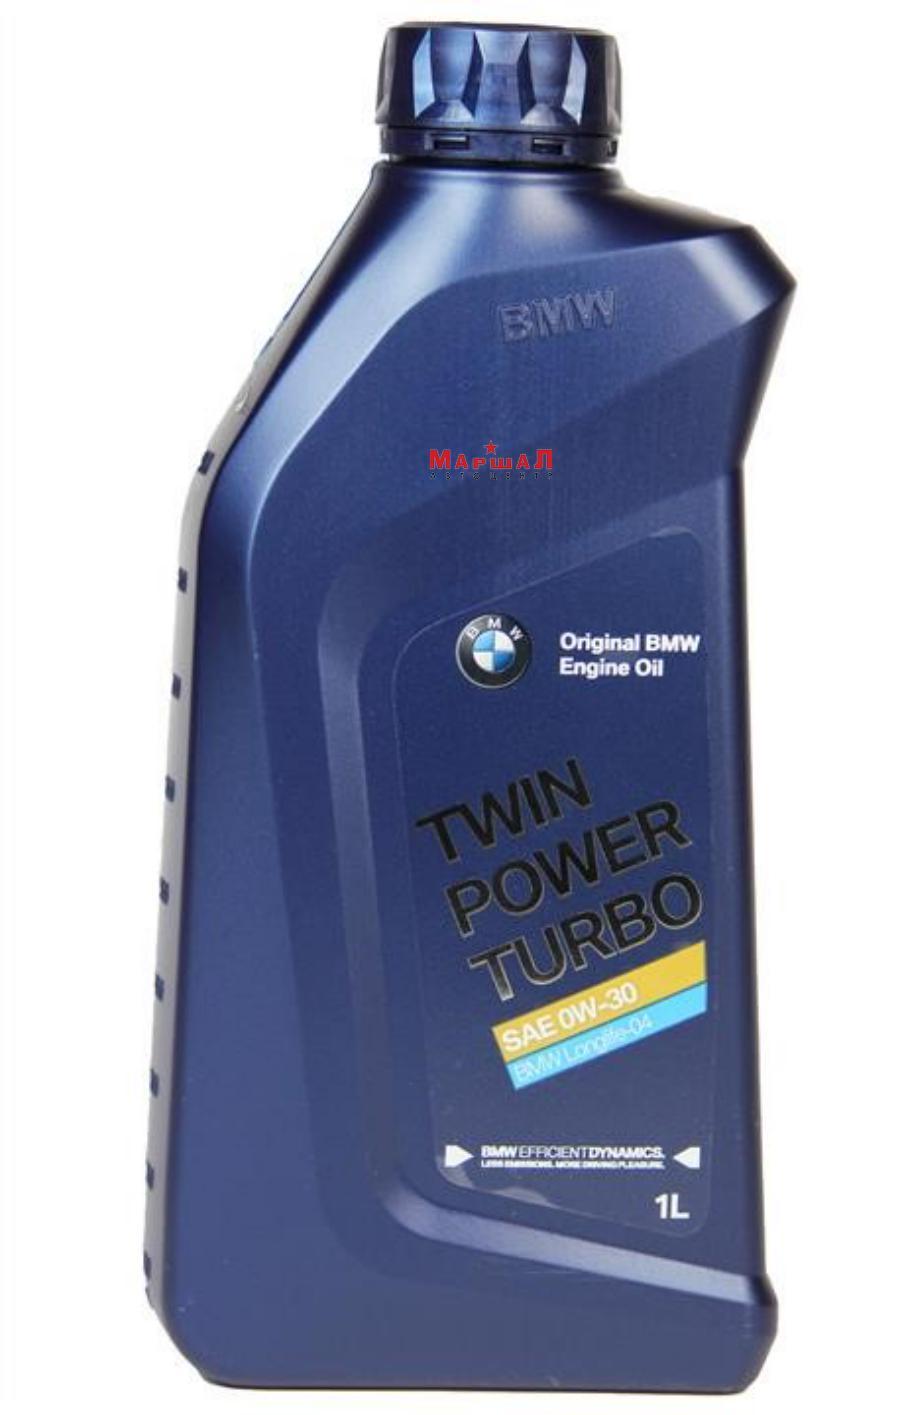 Моторное масло BMW TwinPower Turbo LONGLIFE-04 0W-30, 1л